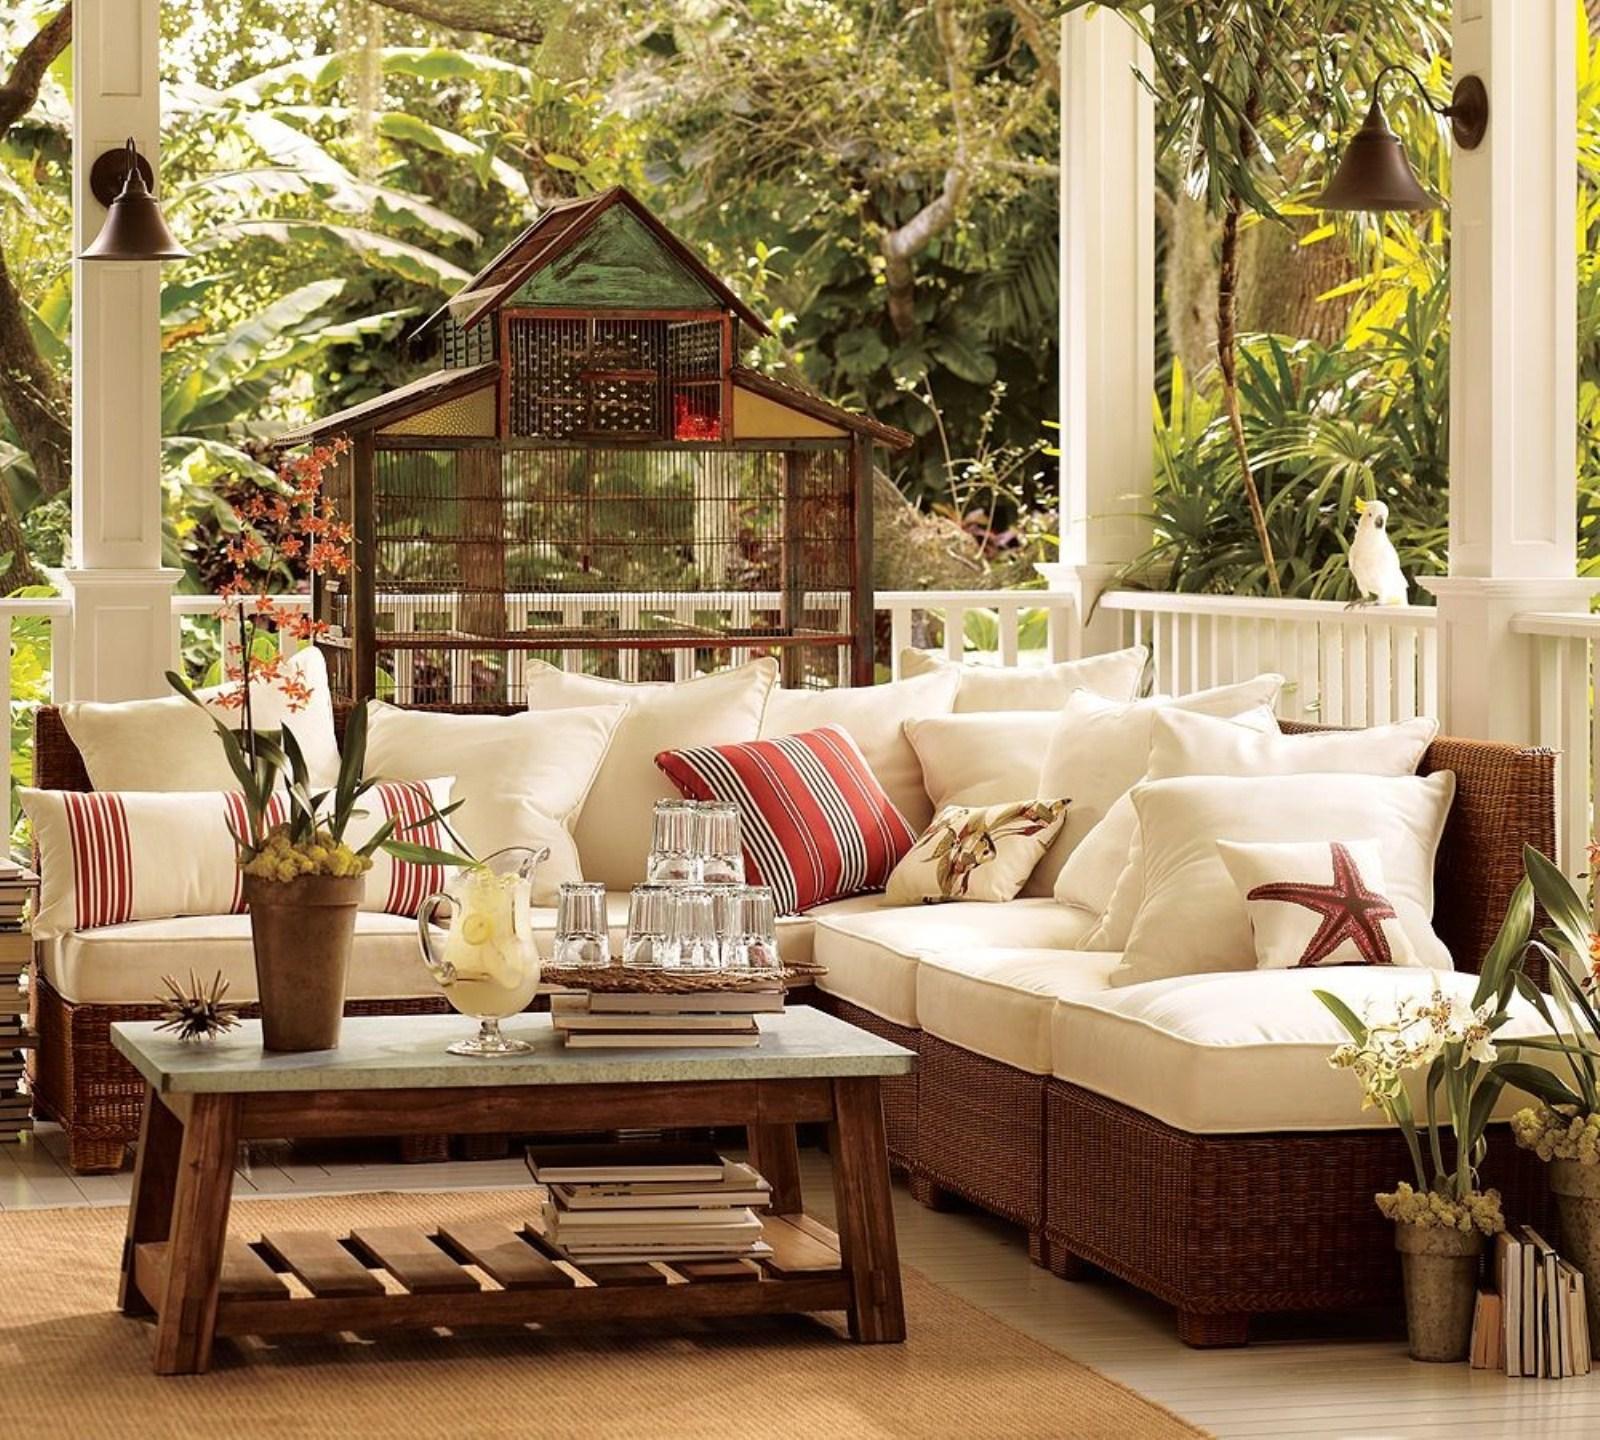 Balcony furniture small - Exterior Design Of Balcony With Cool Small Balcony Furniture